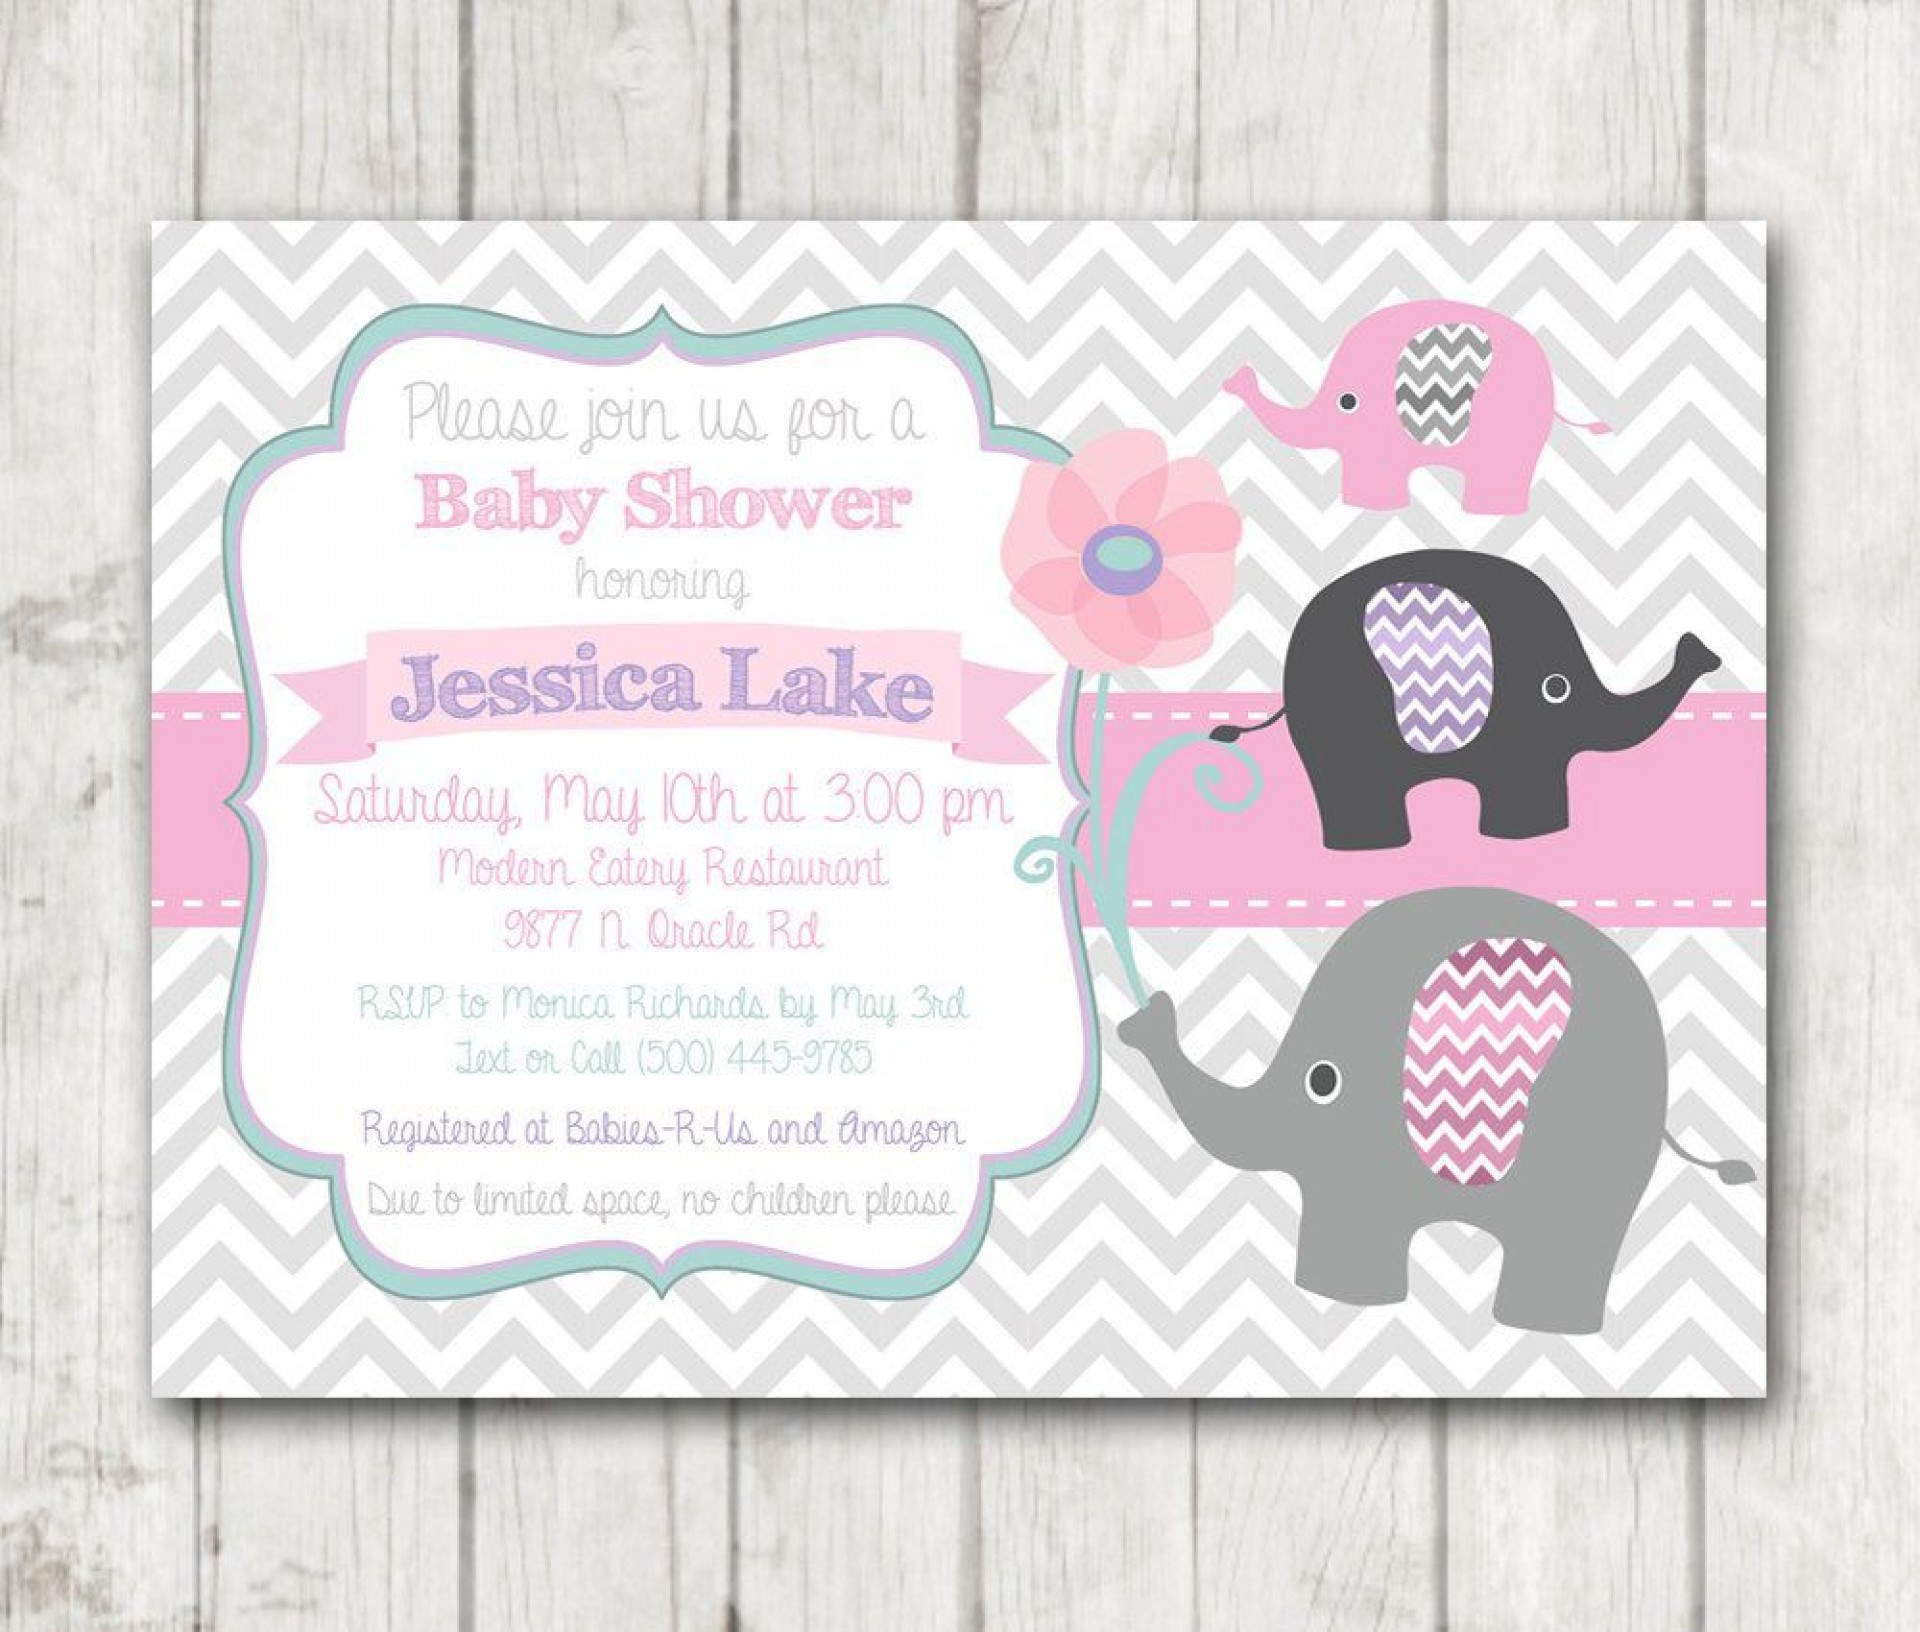 008 Singular Baby Shower Invitation Girl Printable High Def 1920